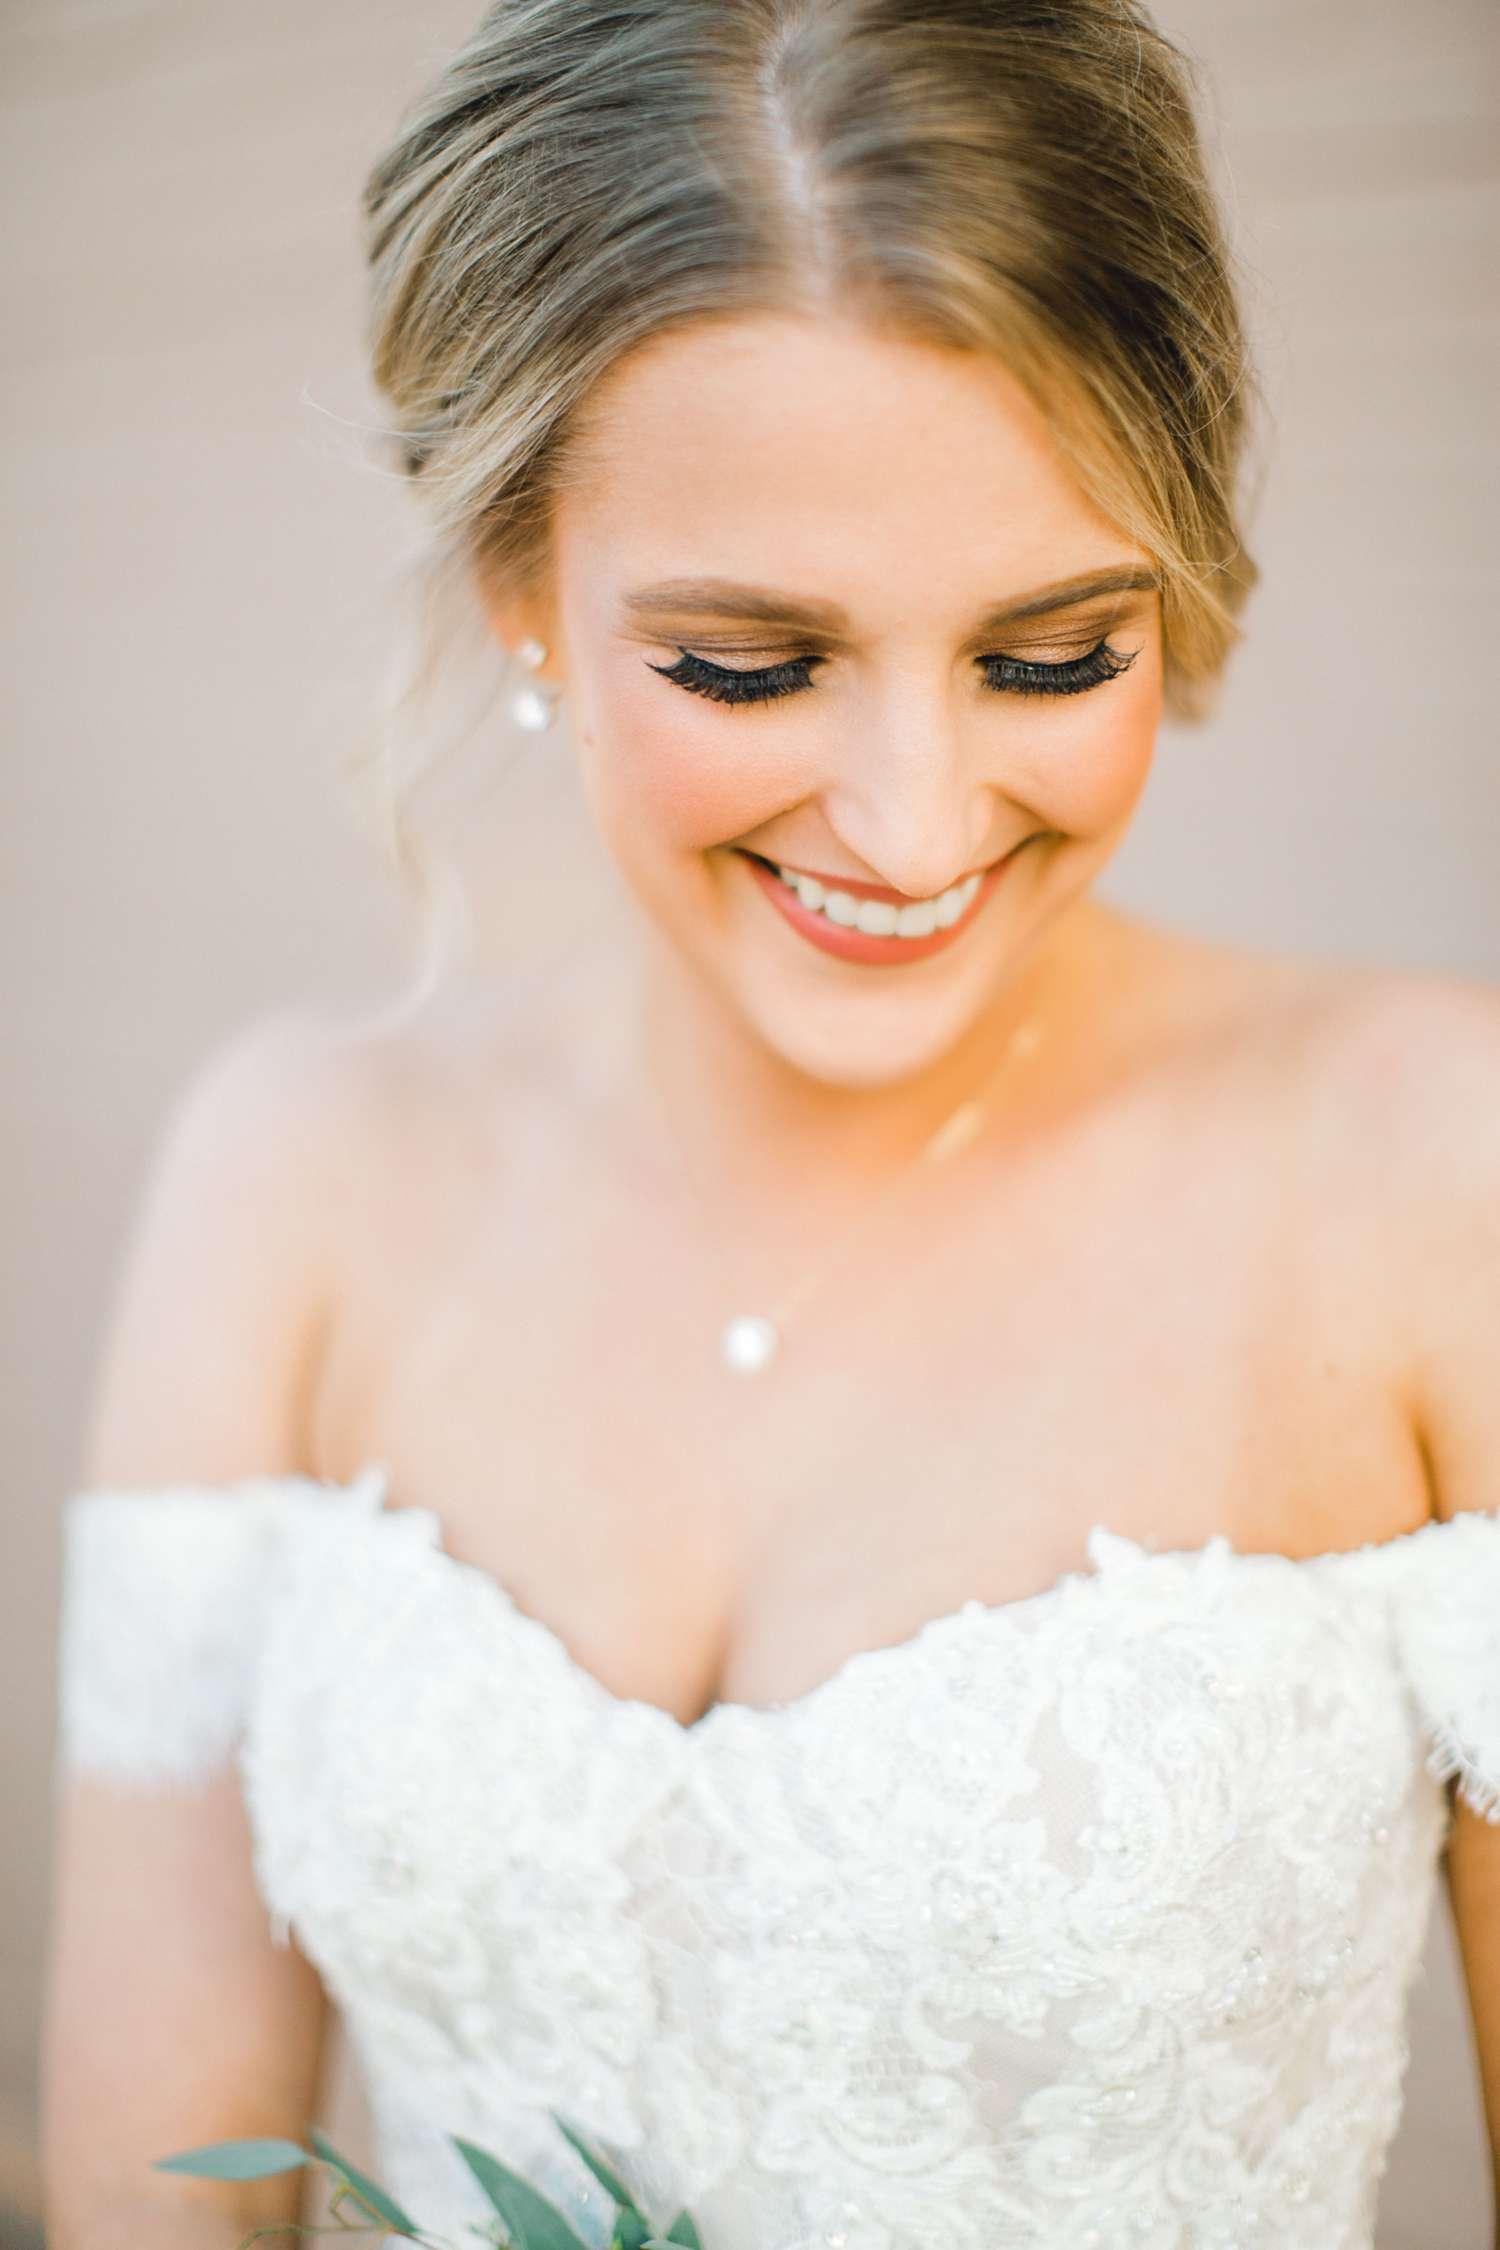 MORGAN+BOONE+BRIDALS+WEDDING+PHOTOGRAPHER_0021.jpg